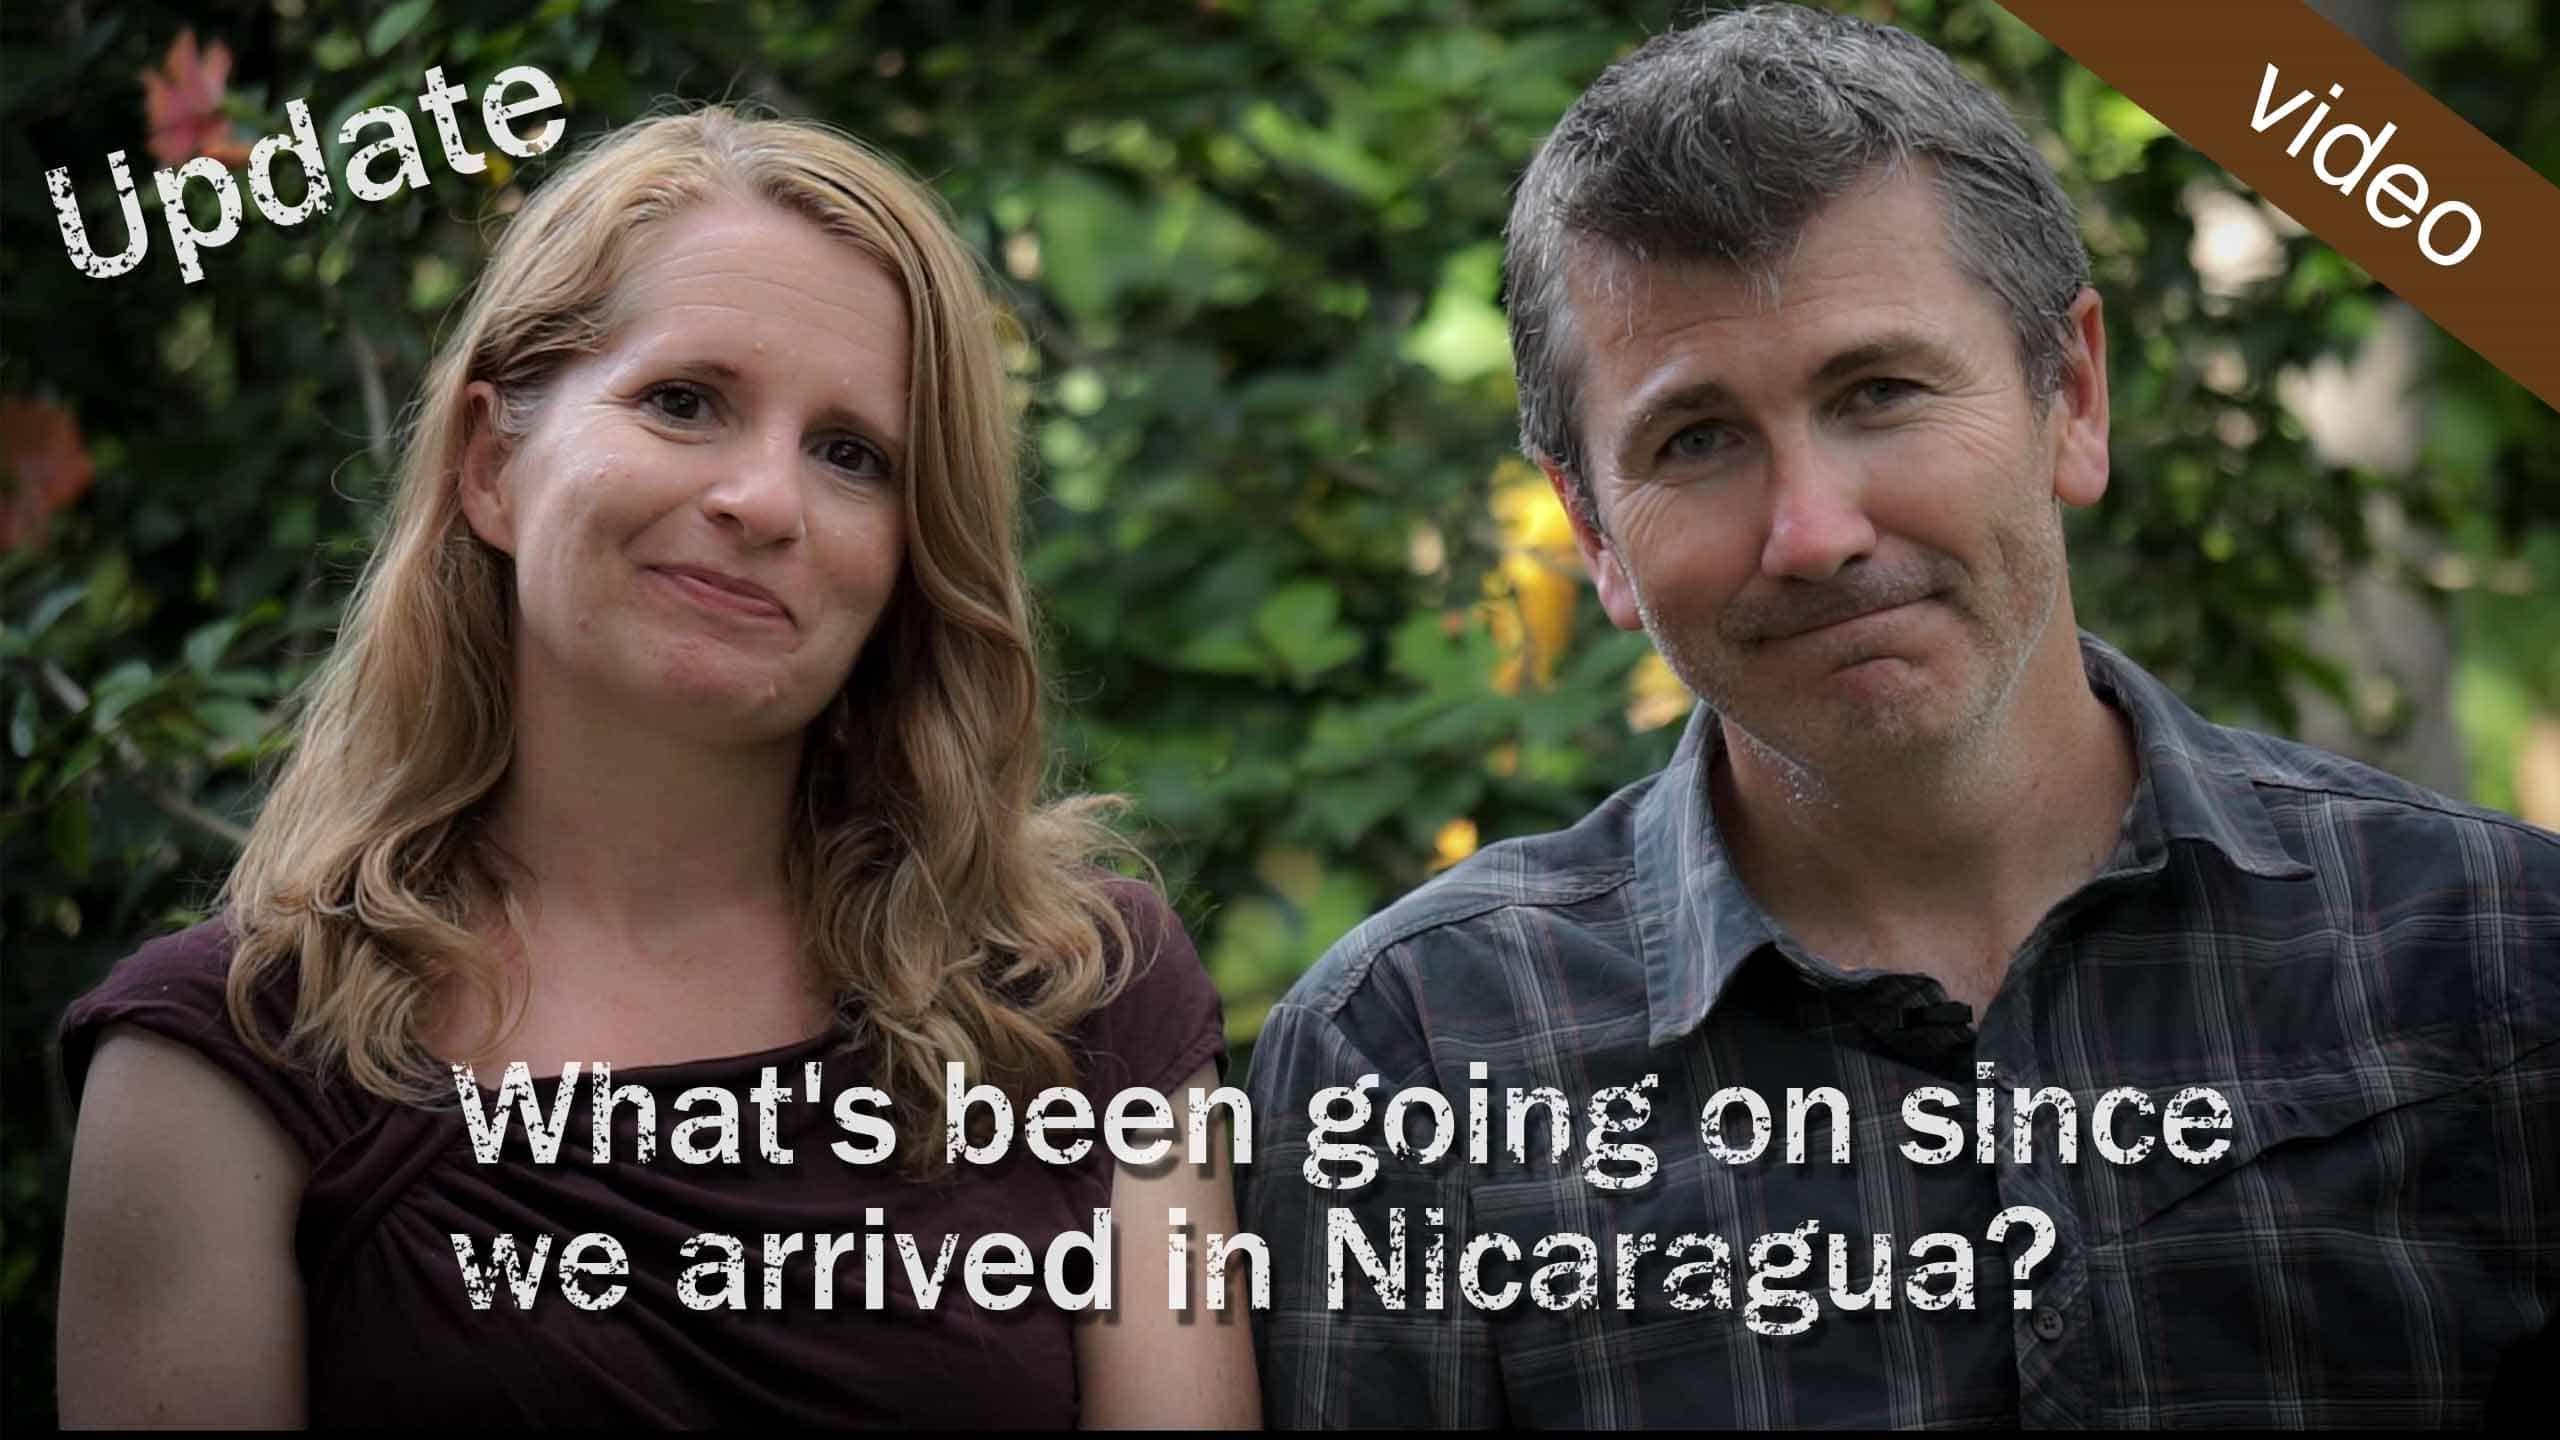 Video Update In Nicaragua